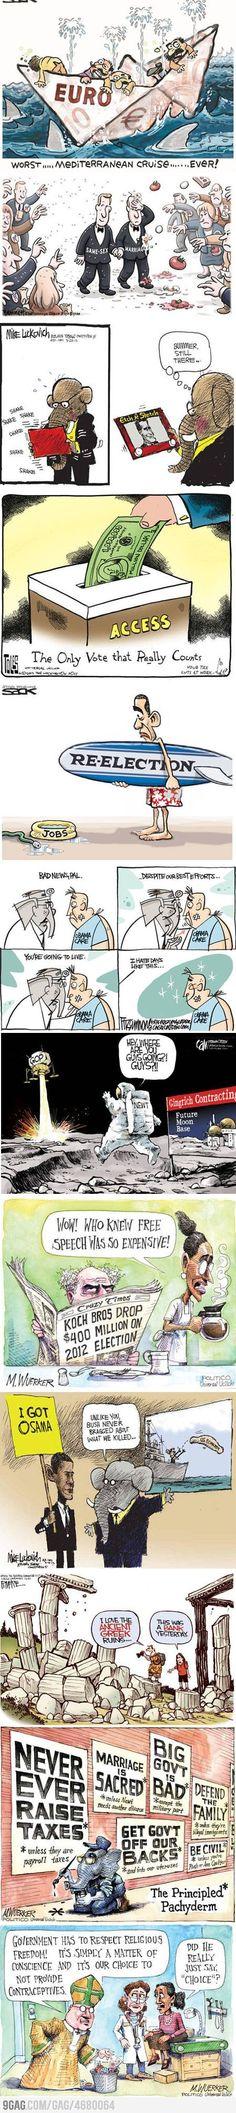 Top Political Cartoons